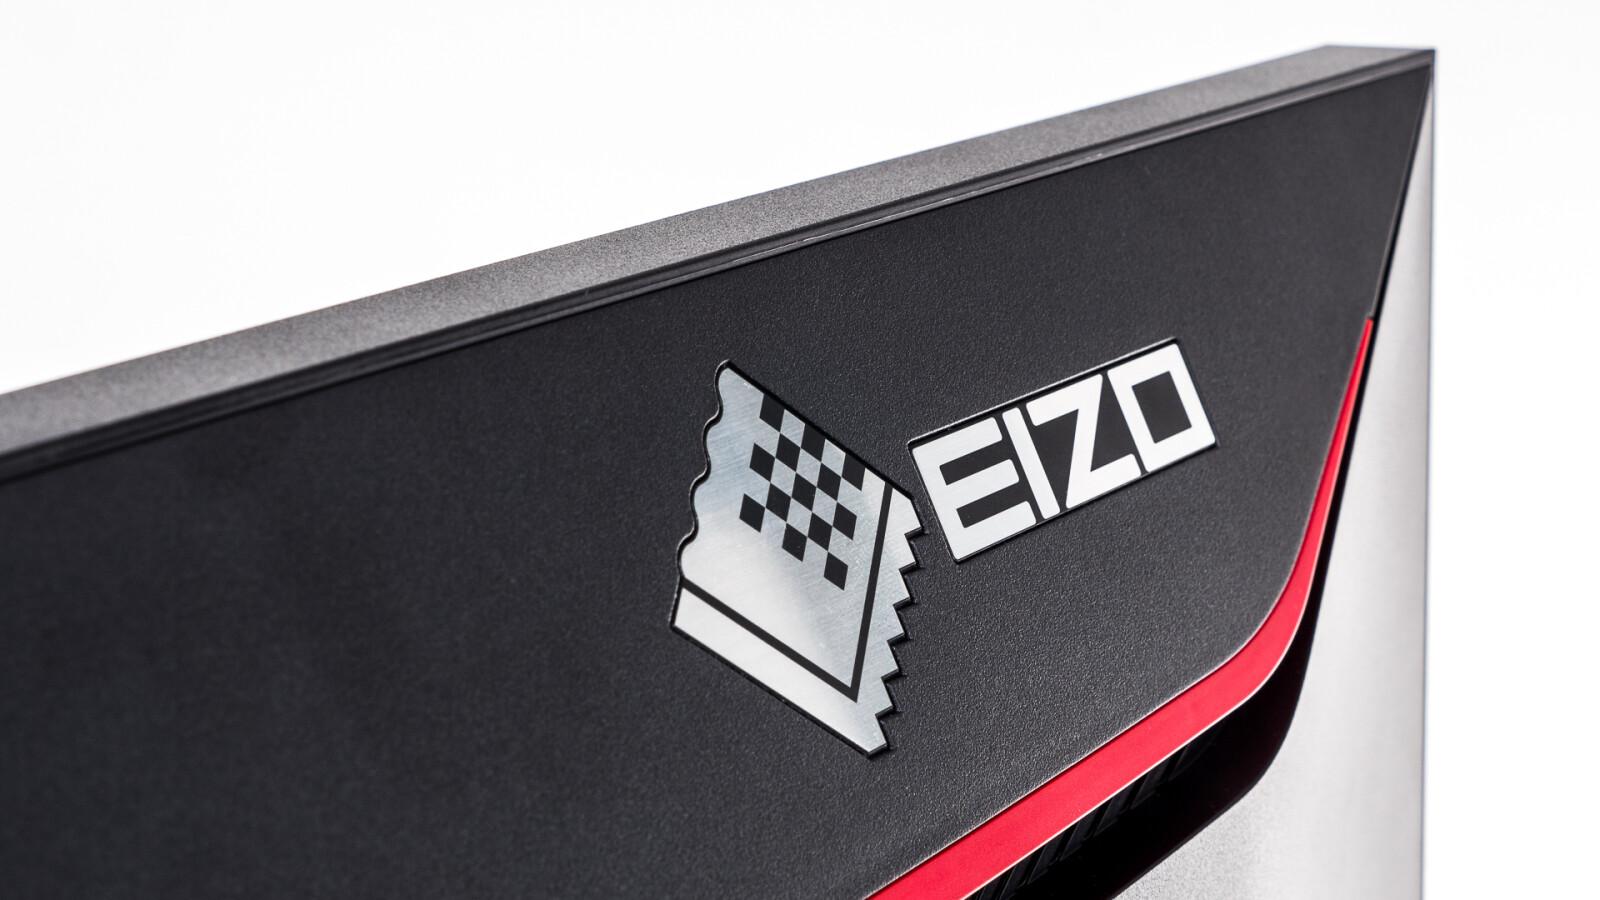 Eizo Foris FS 2735 im Test: Der Ego-Shooter-Monitor